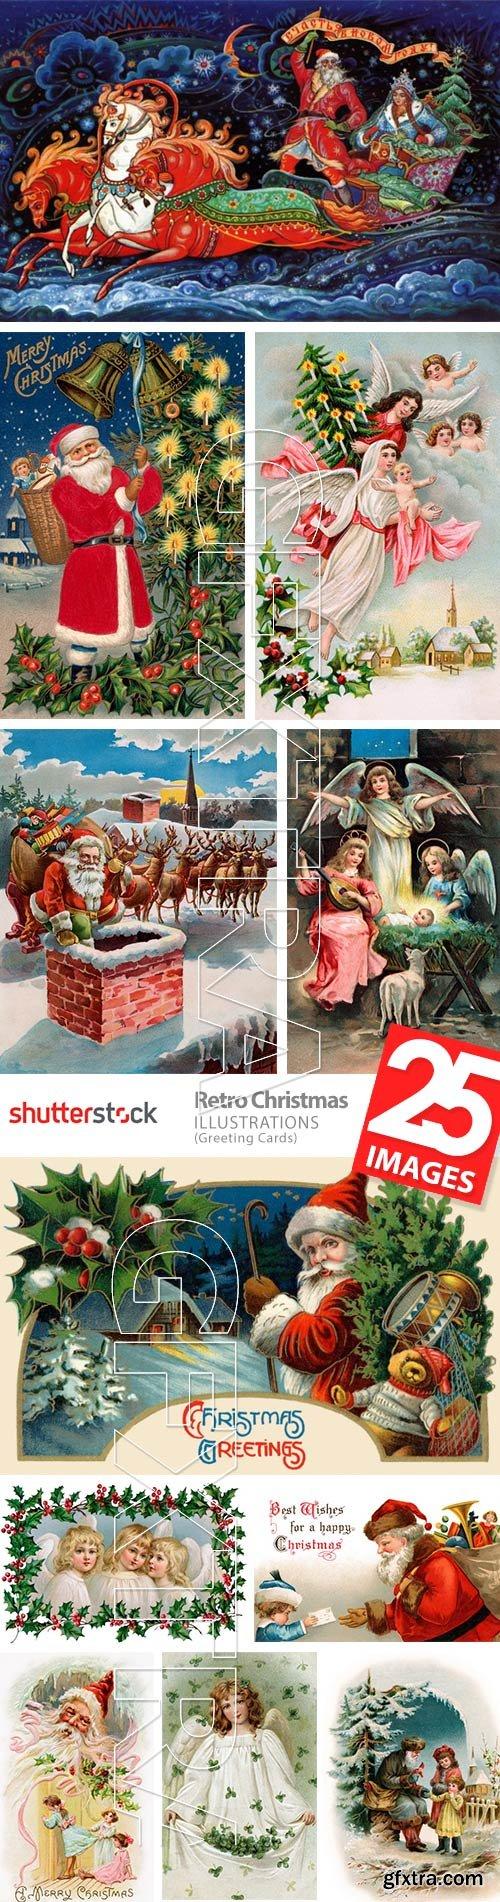 Retro Christmas Illustrations 25xJPG